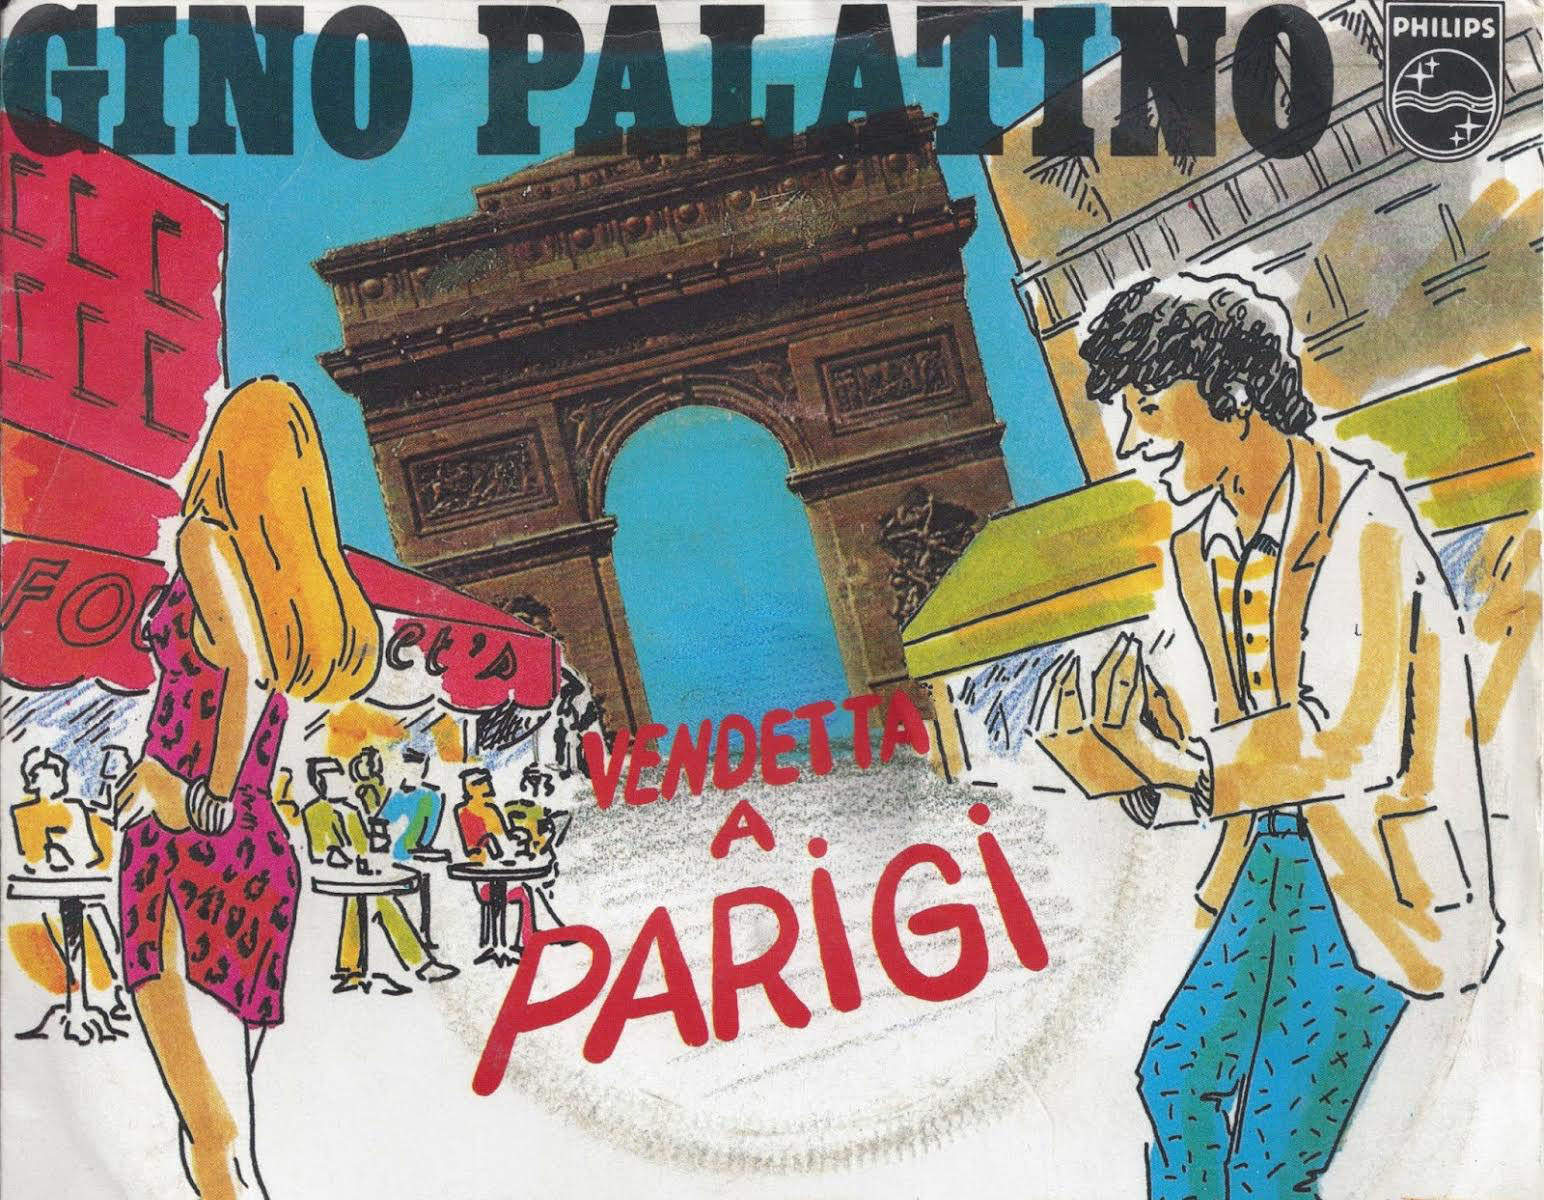 Gino Palatino, Vendetta a Parigi